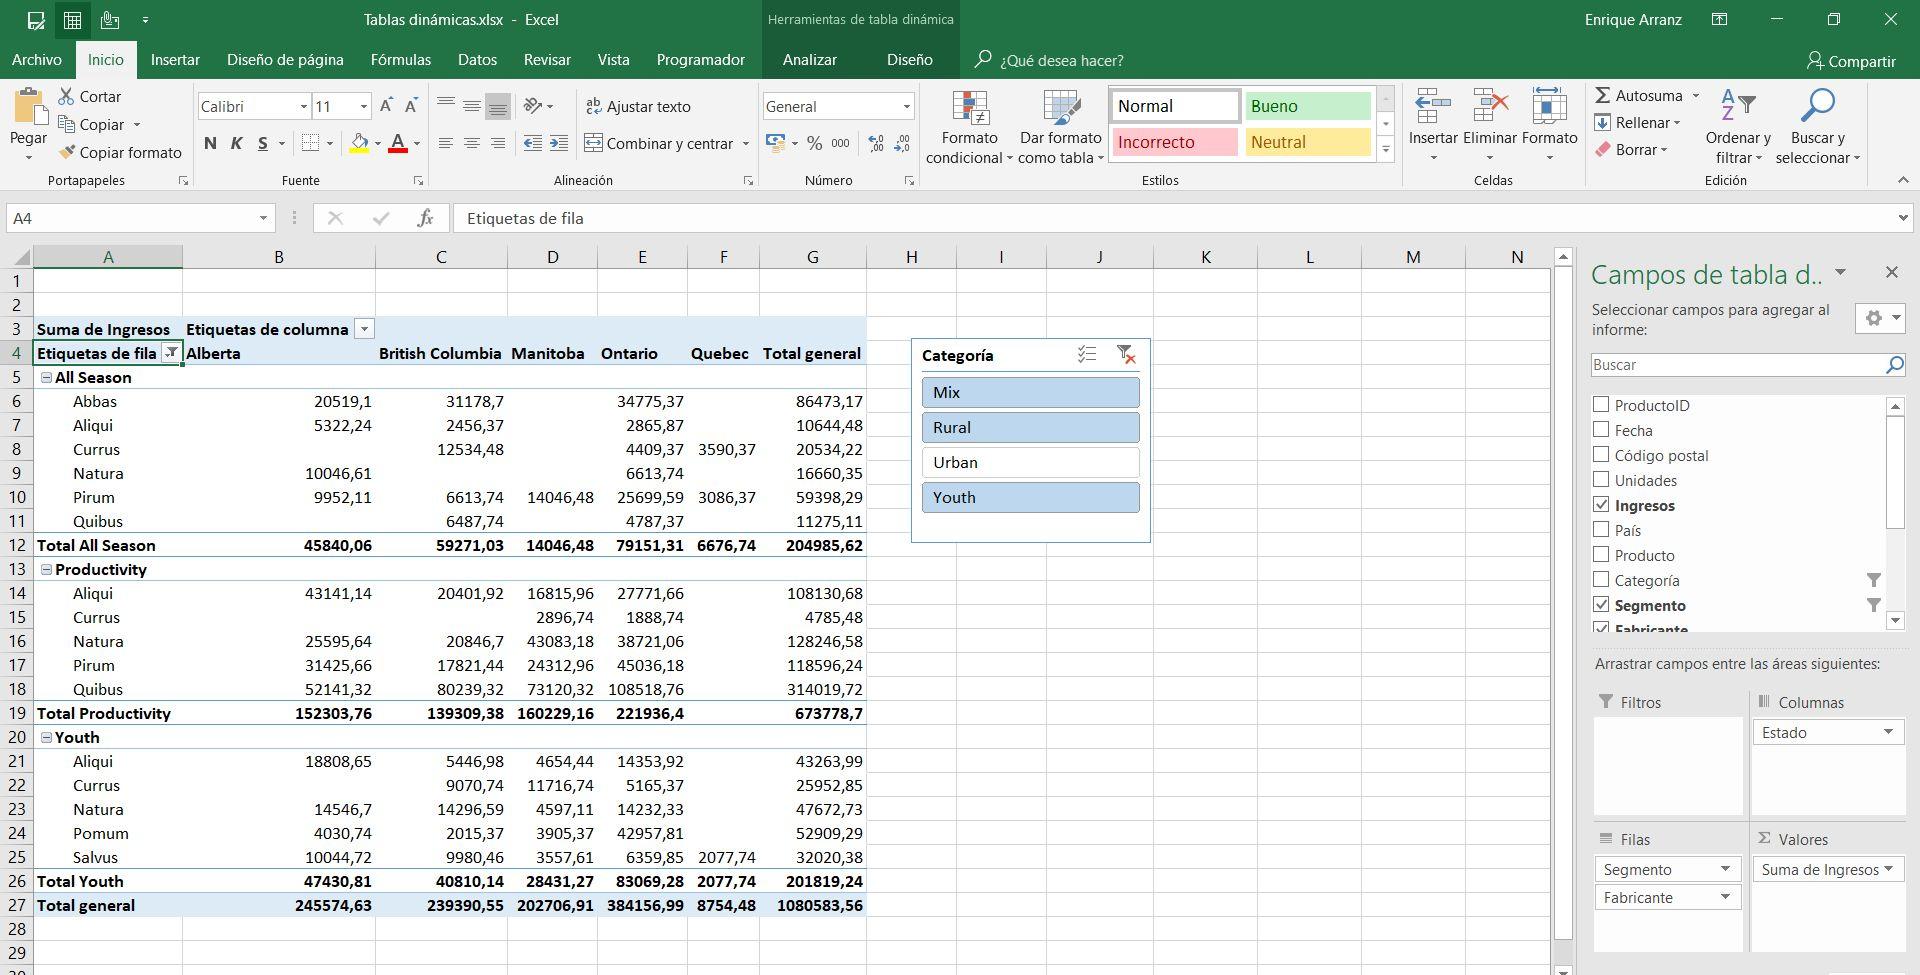 tablas dinámicas análisis de datos